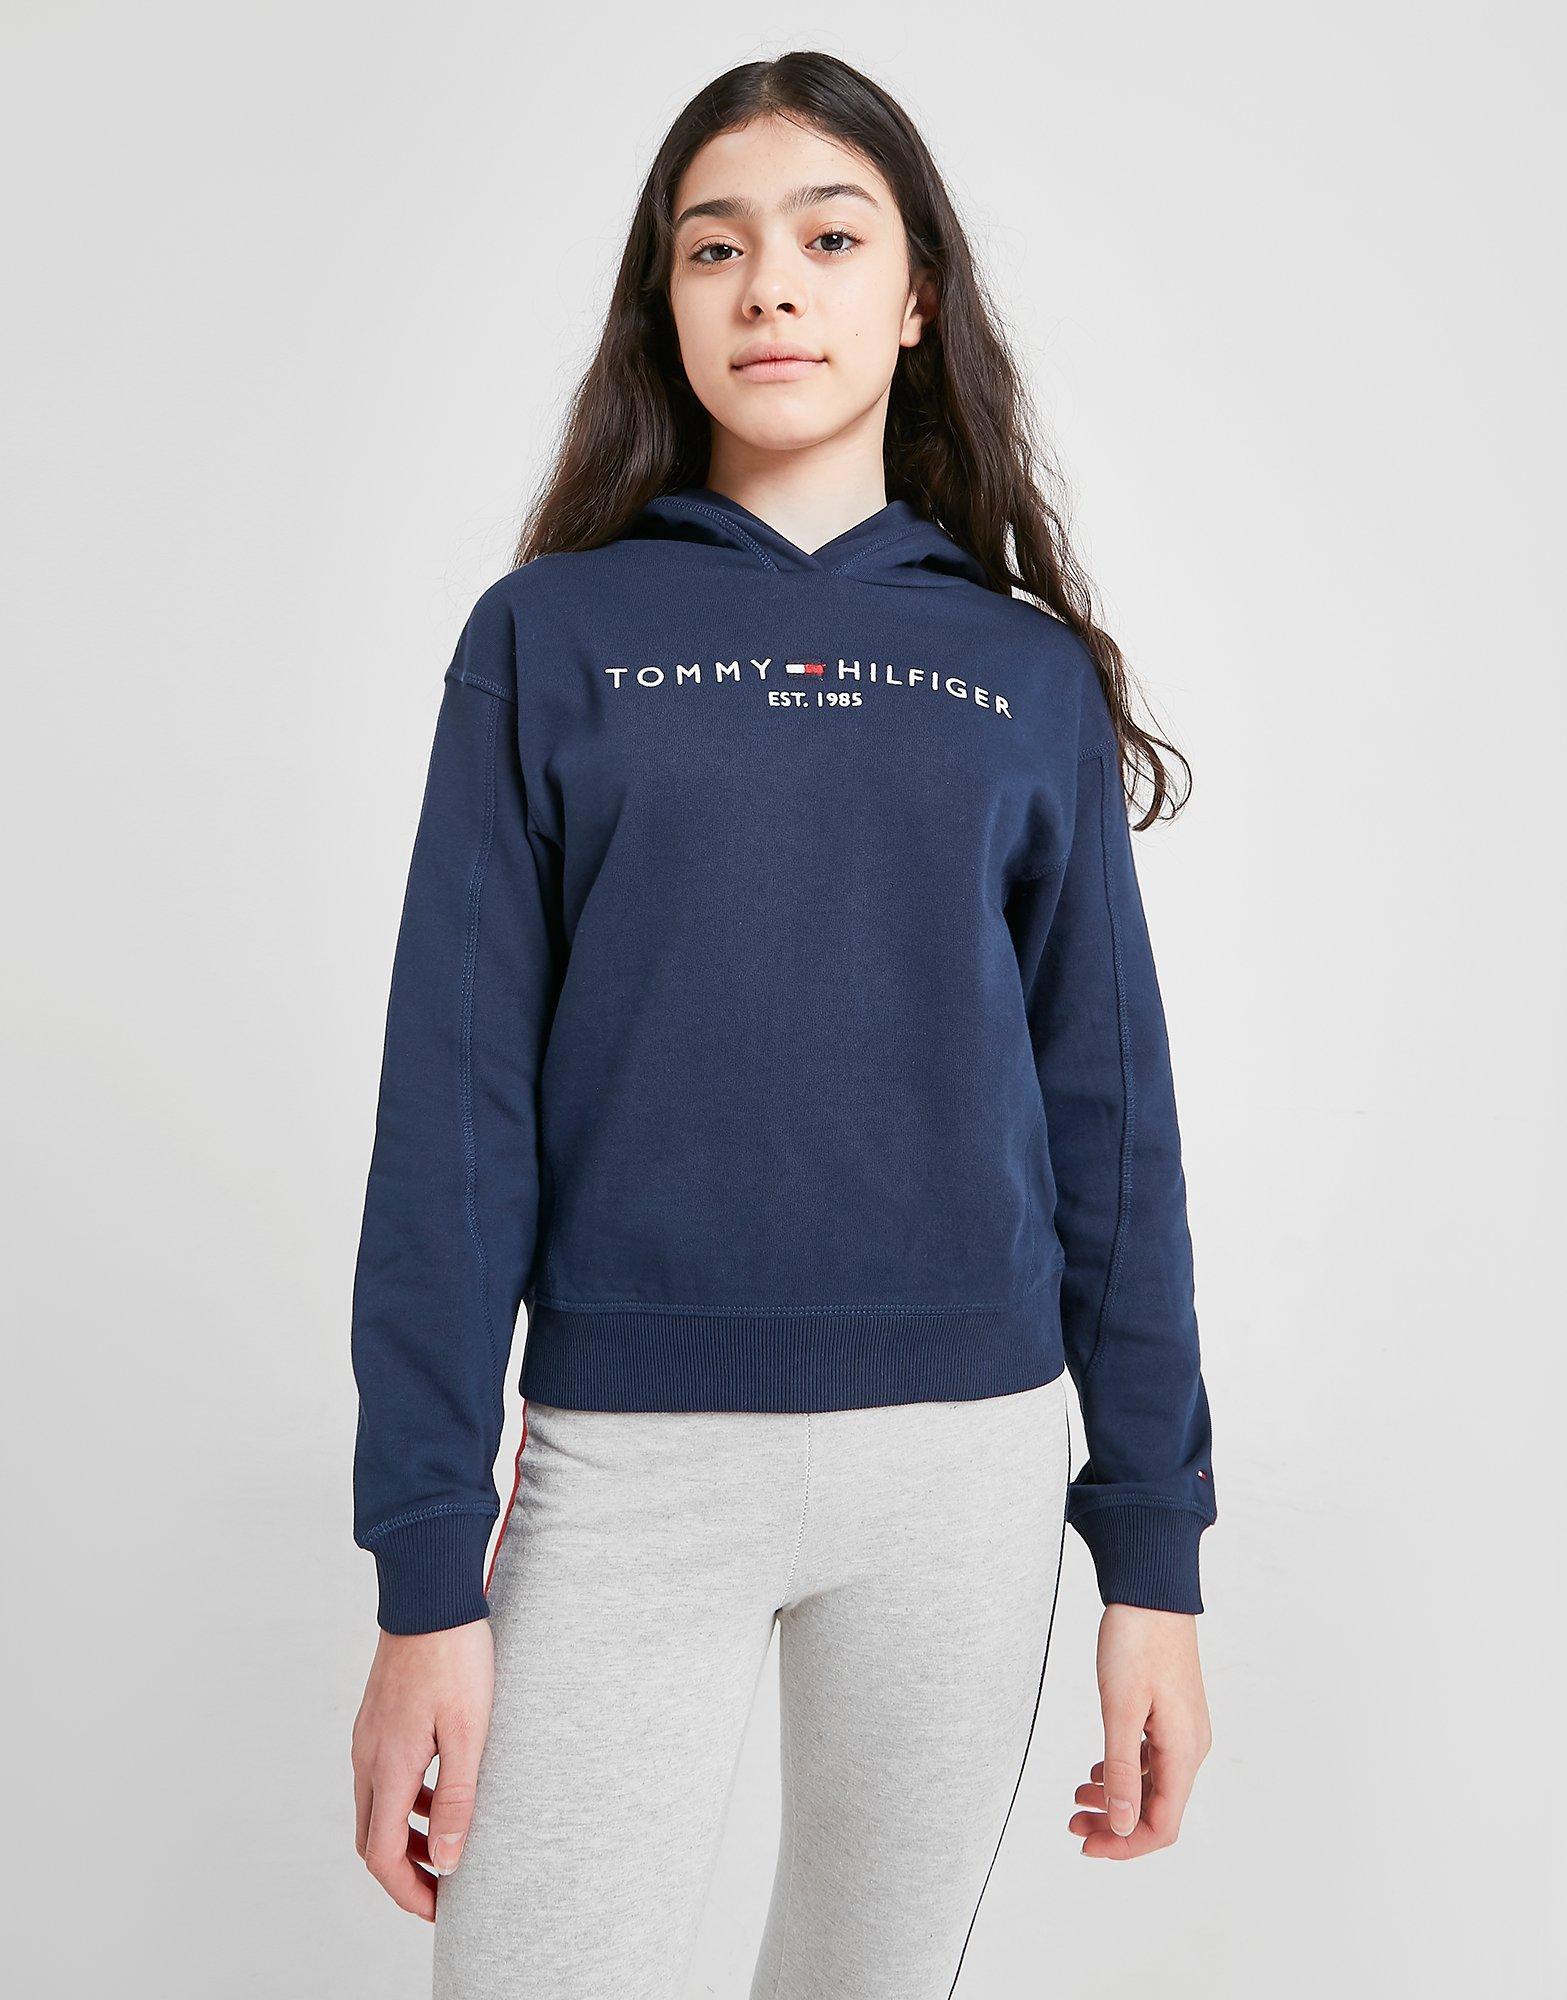 blue champion sweatshirt